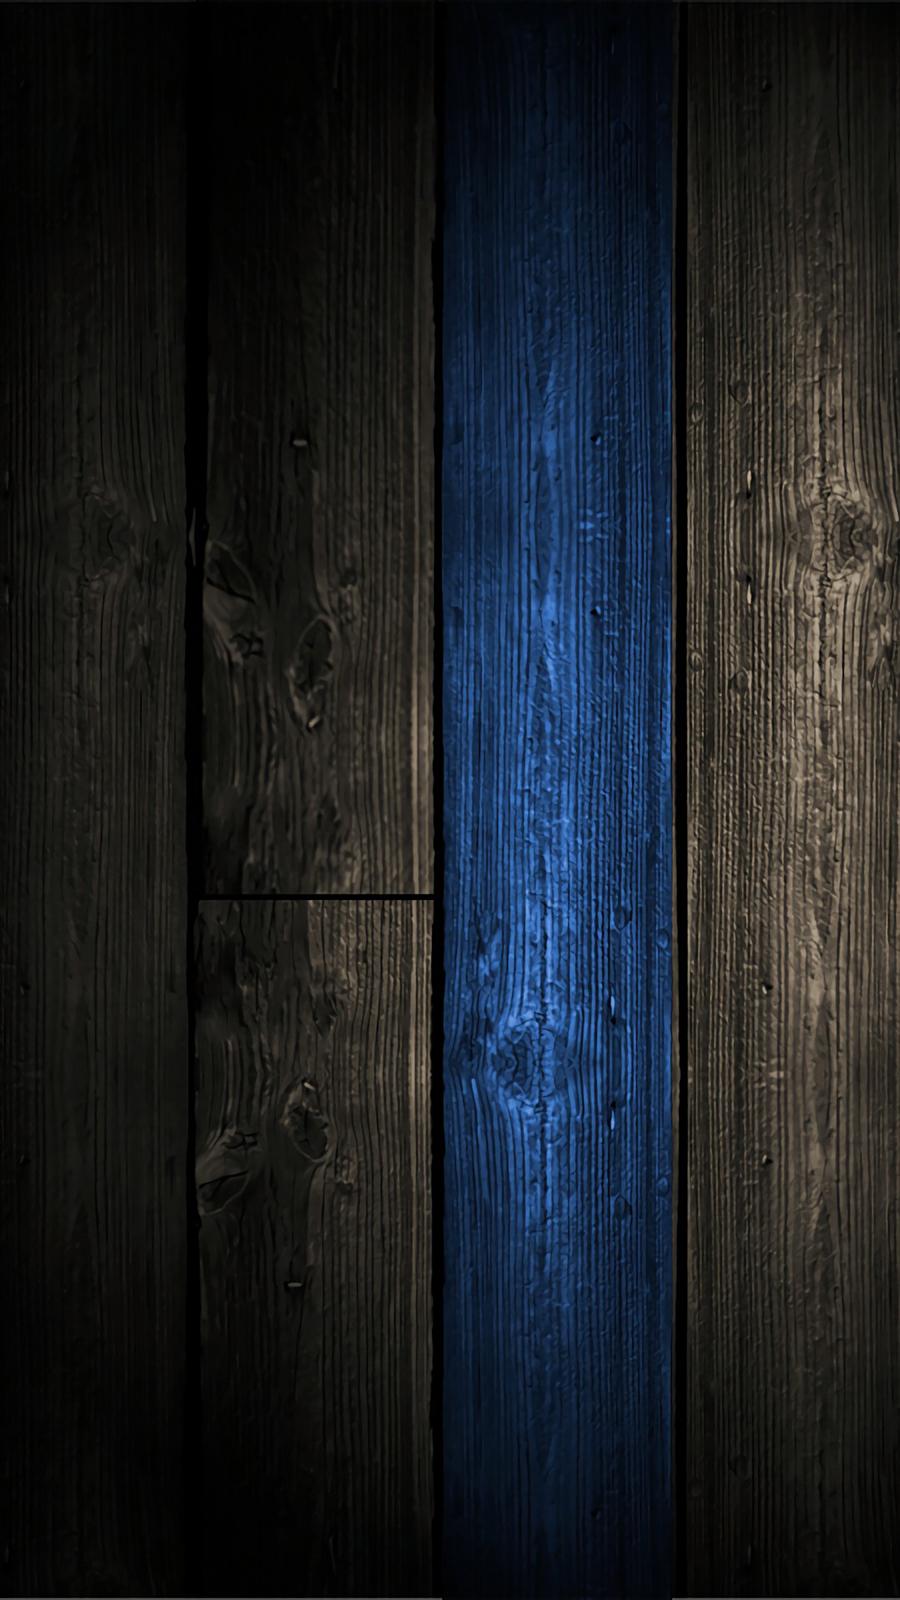 Blue Wood Wallpaper